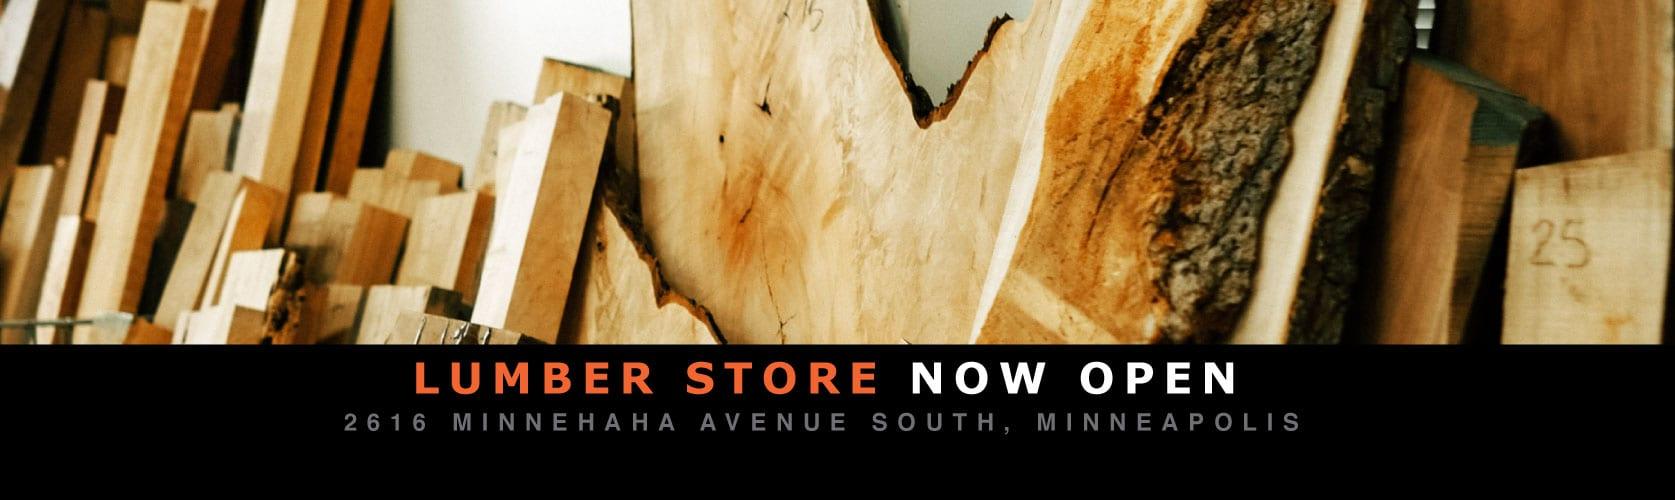 lumber Minneapolis reclaimed urban wood from the hood